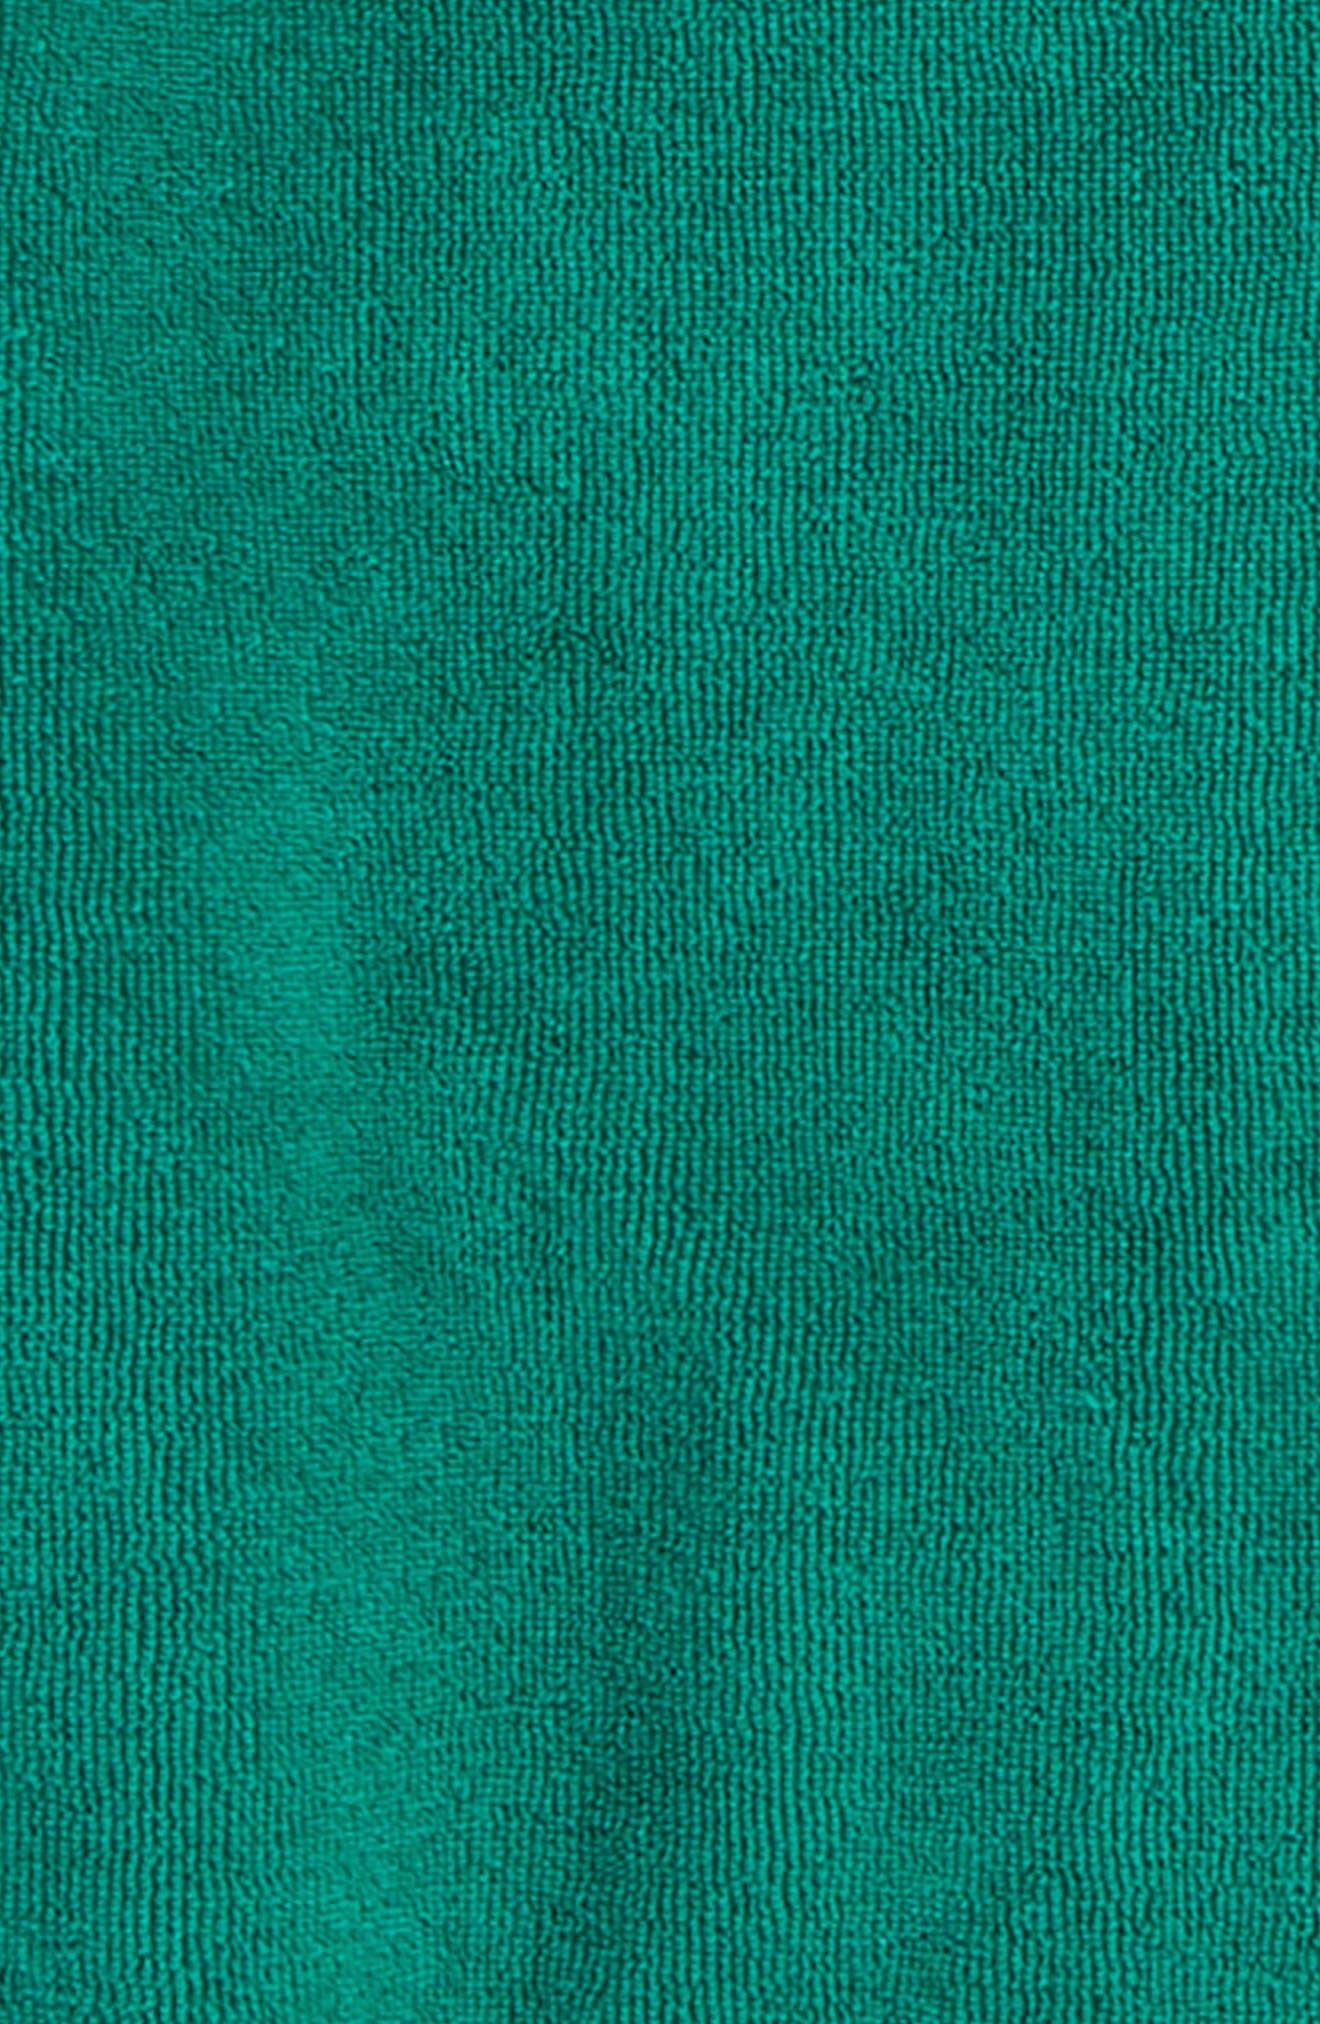 Green Lake Gator Towel Cover-Up,                             Alternate thumbnail 2, color,                             310